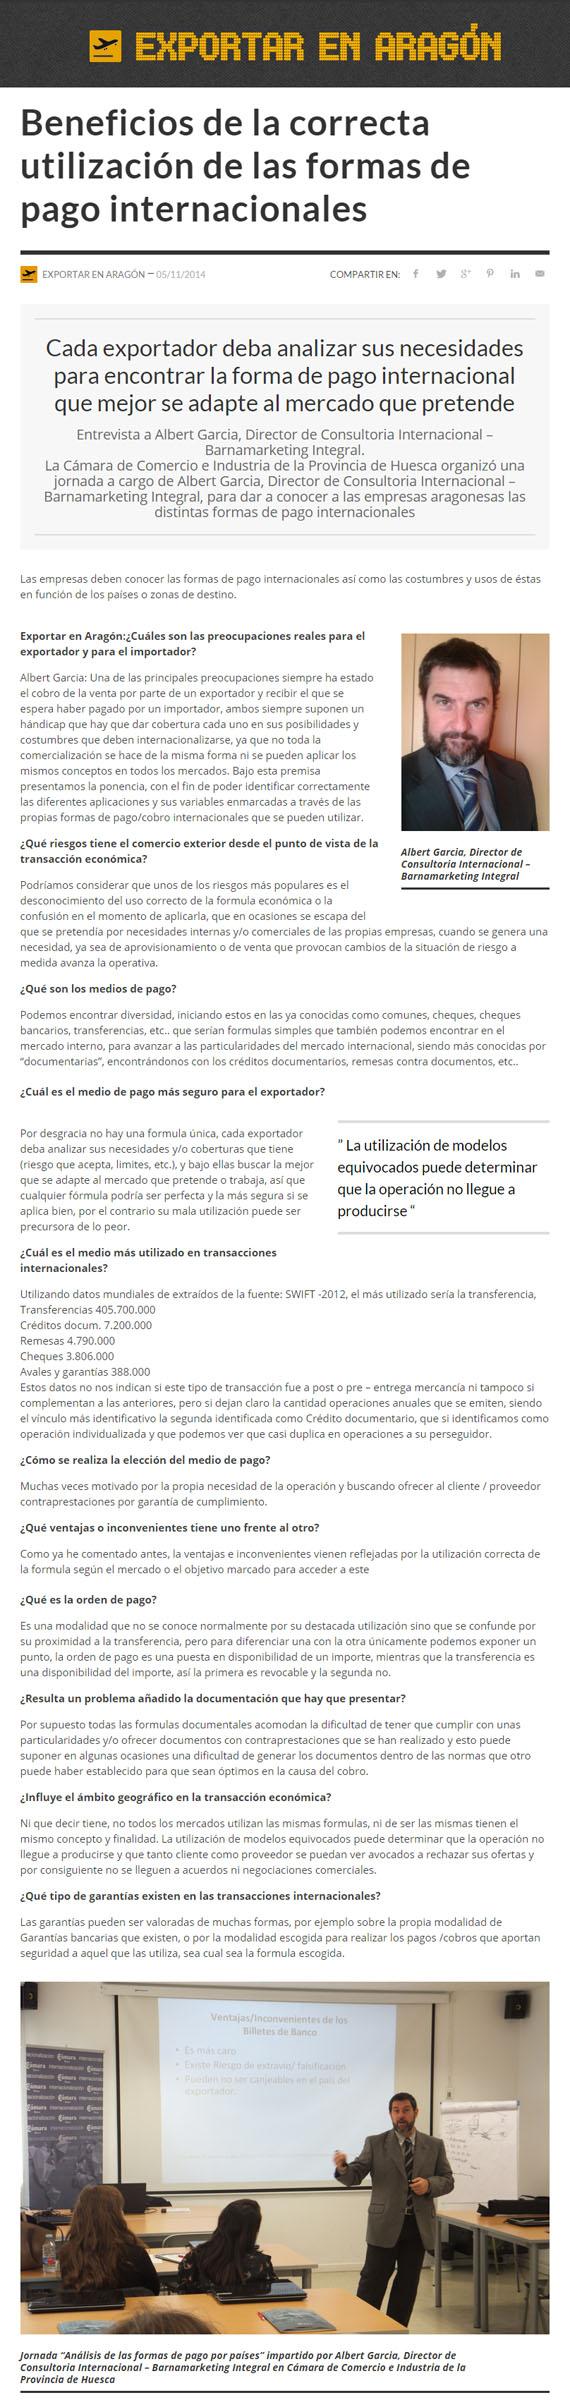 exportaremaragon_05112014